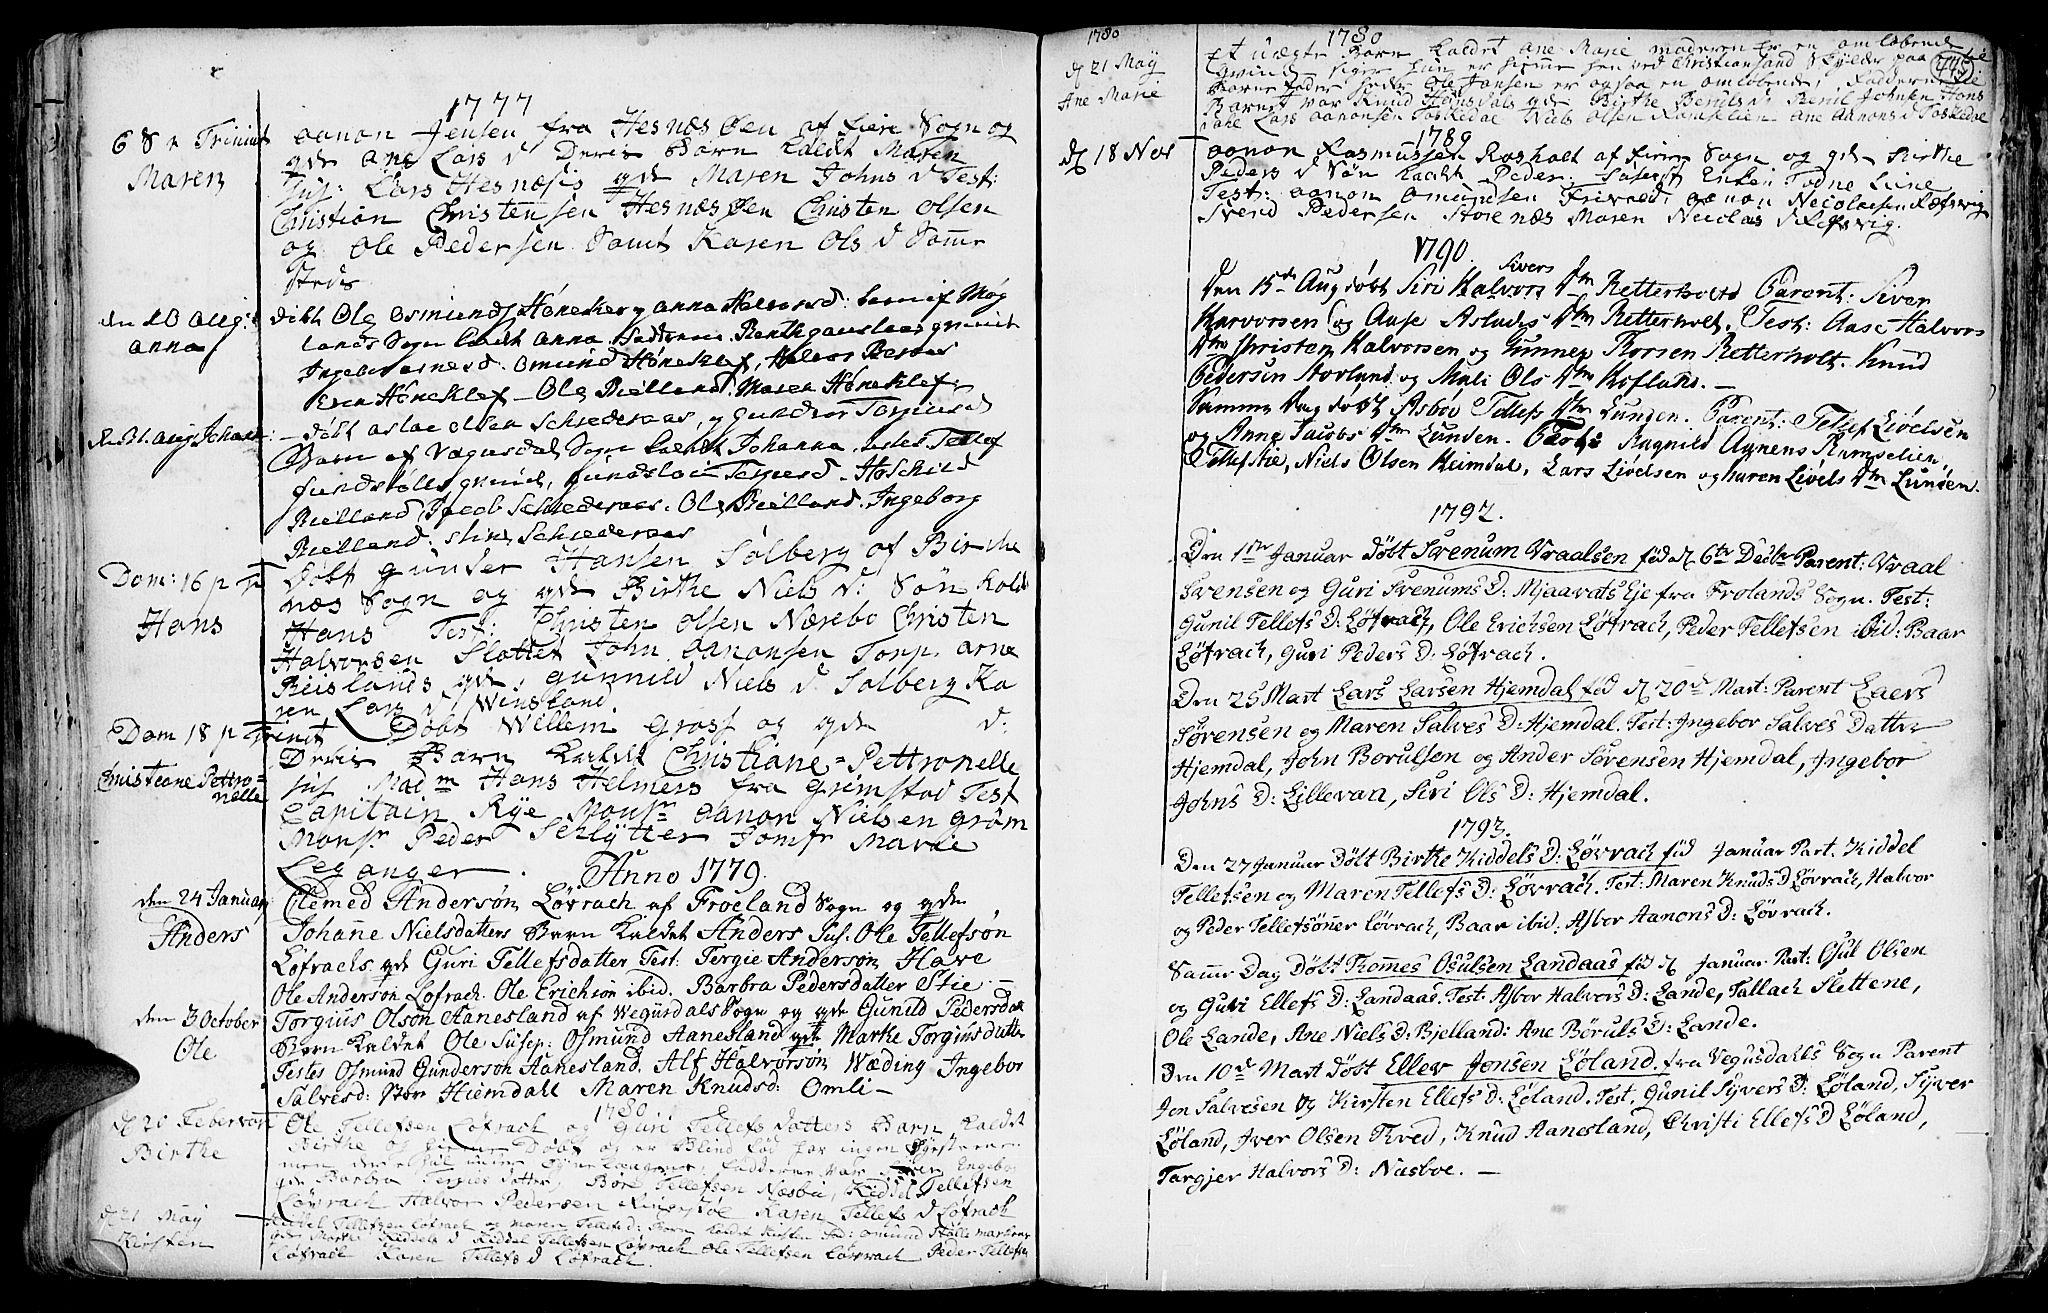 SAK, Hommedal sokneprestkontor, F/Fa/Fab/L0002: Ministerialbok nr. A 2 /3, 1740-1821, s. 445